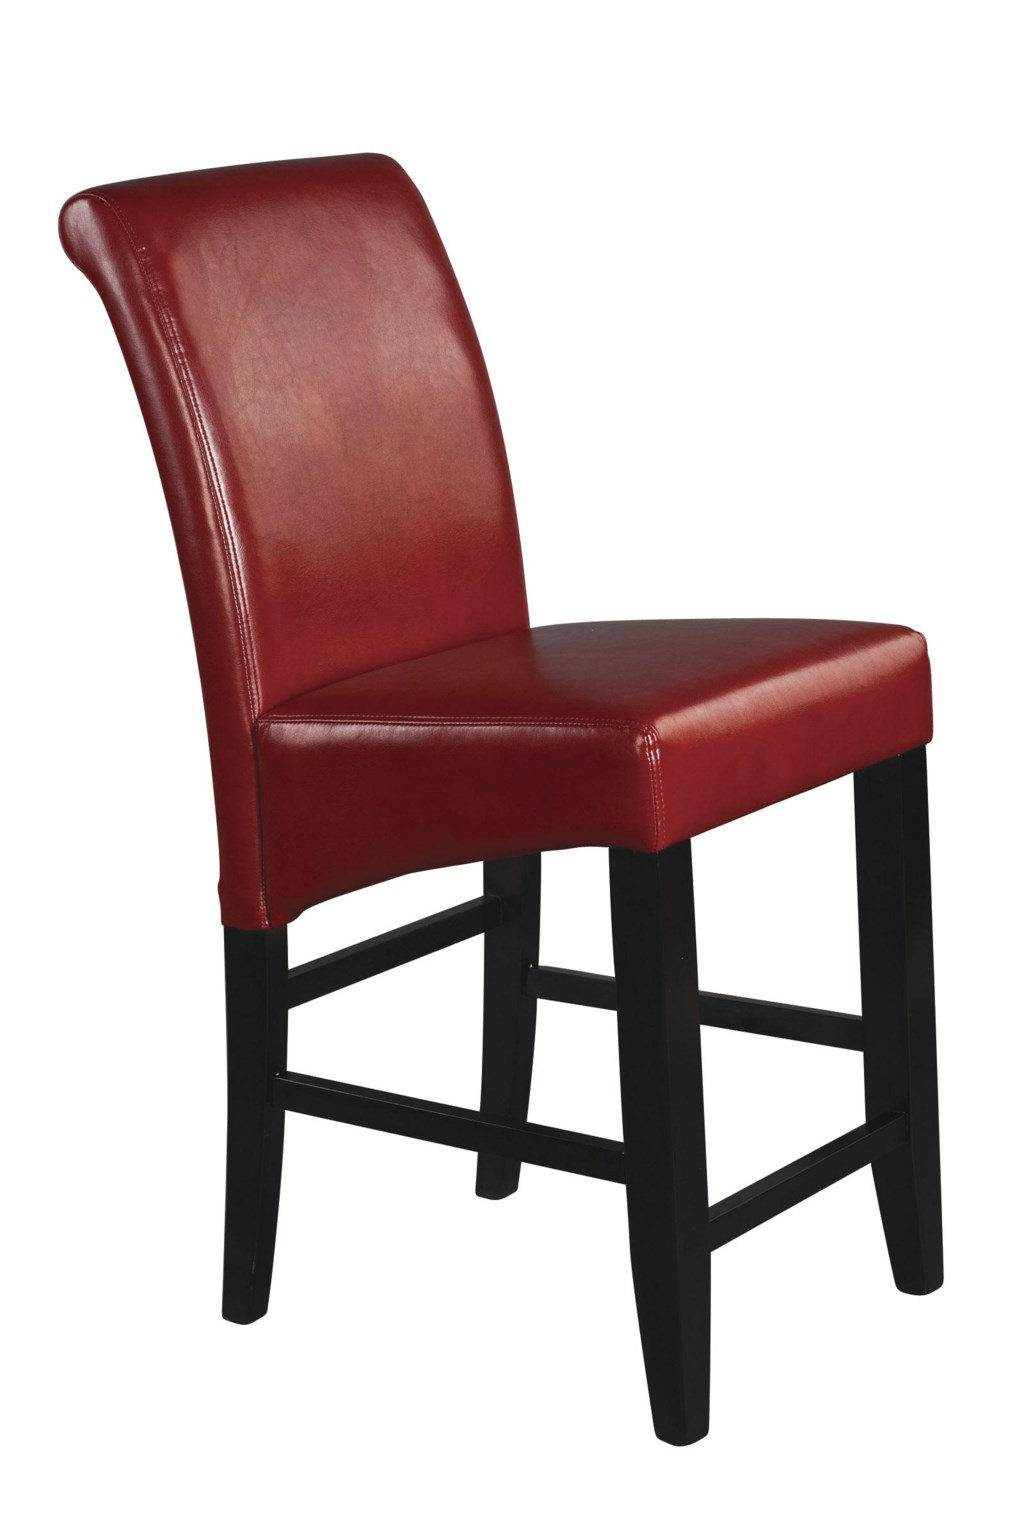 Office Star Parson Bar Stools 24 Inch Eco Red Bar Stool Knight